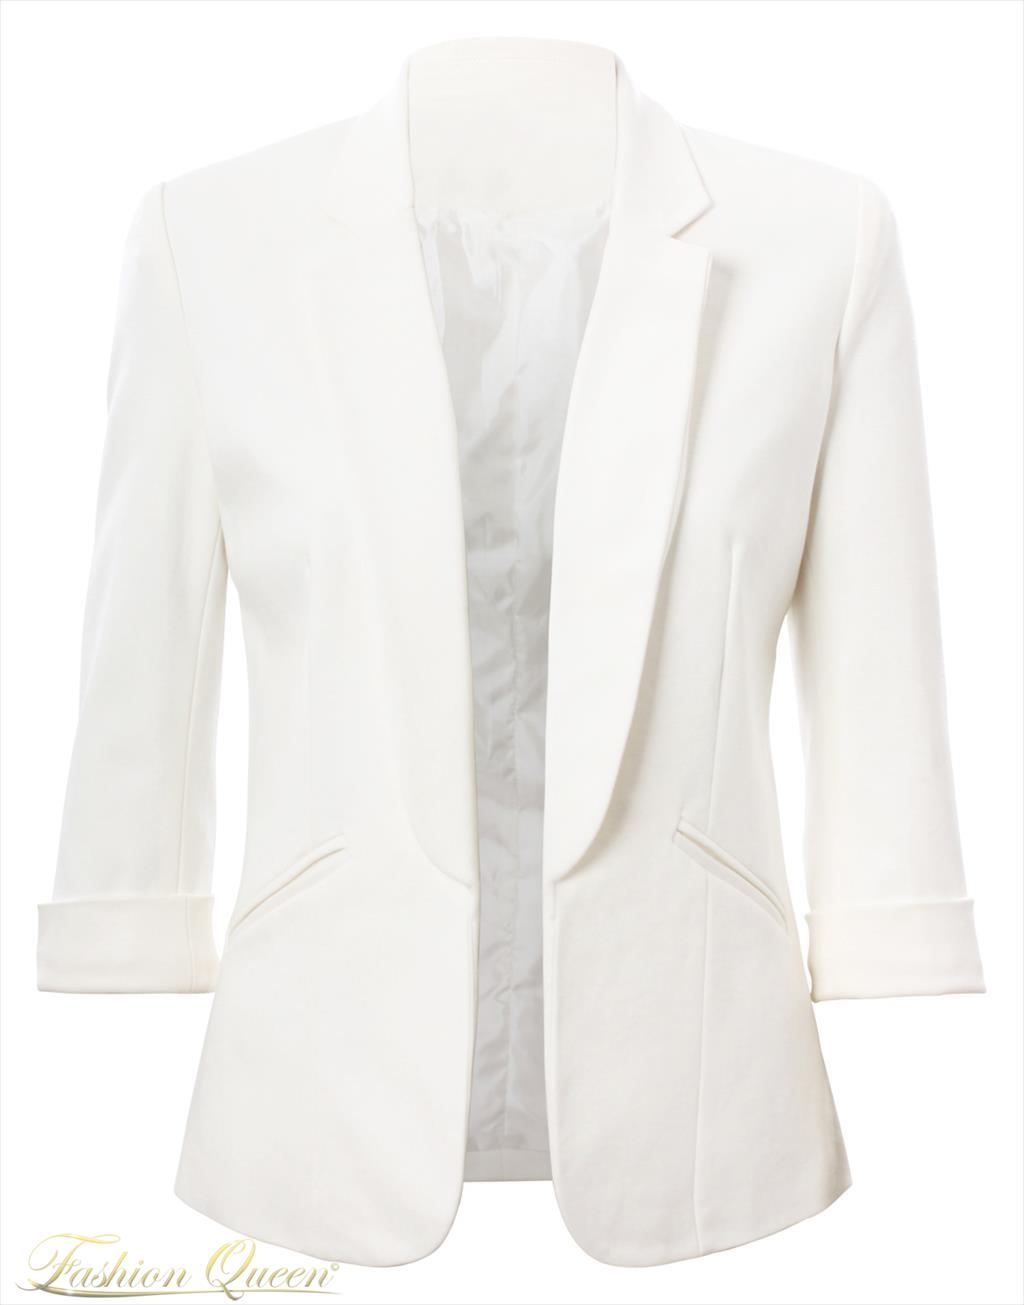 Fashion Queen - Dámske oblečenie a móda - Biele sako 25fc096f895